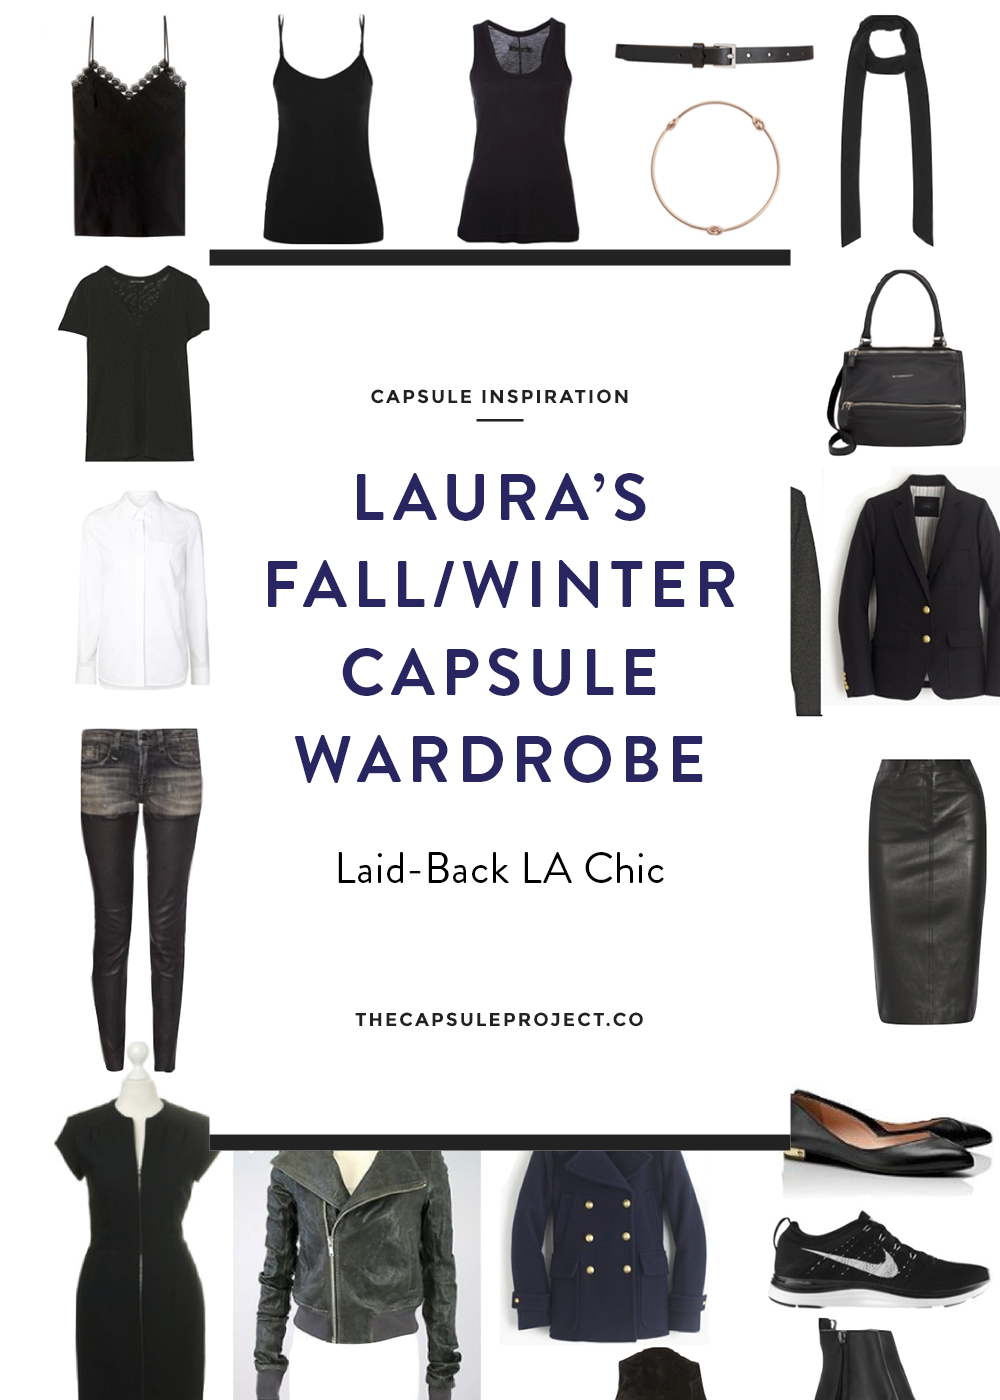 Winter Capsule Wardrobe For 2017 And 2018: Reader Feature: Laura's LA Chic Fall/Winter Capsule